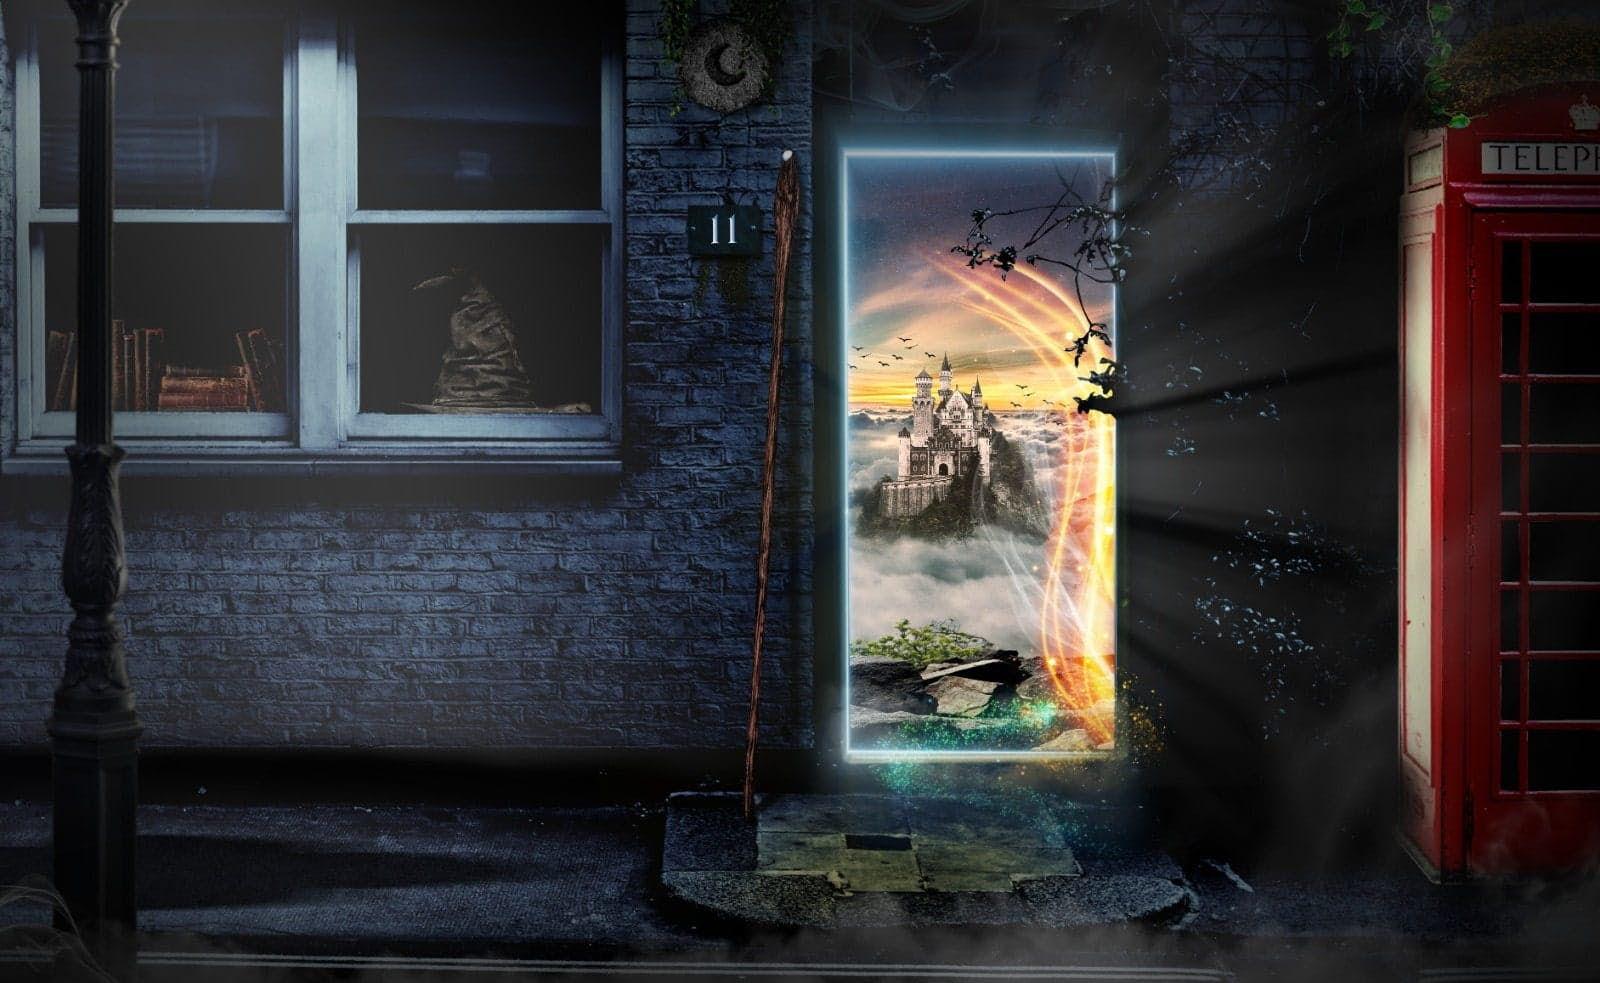 Magic London: The City of Harry Potter image